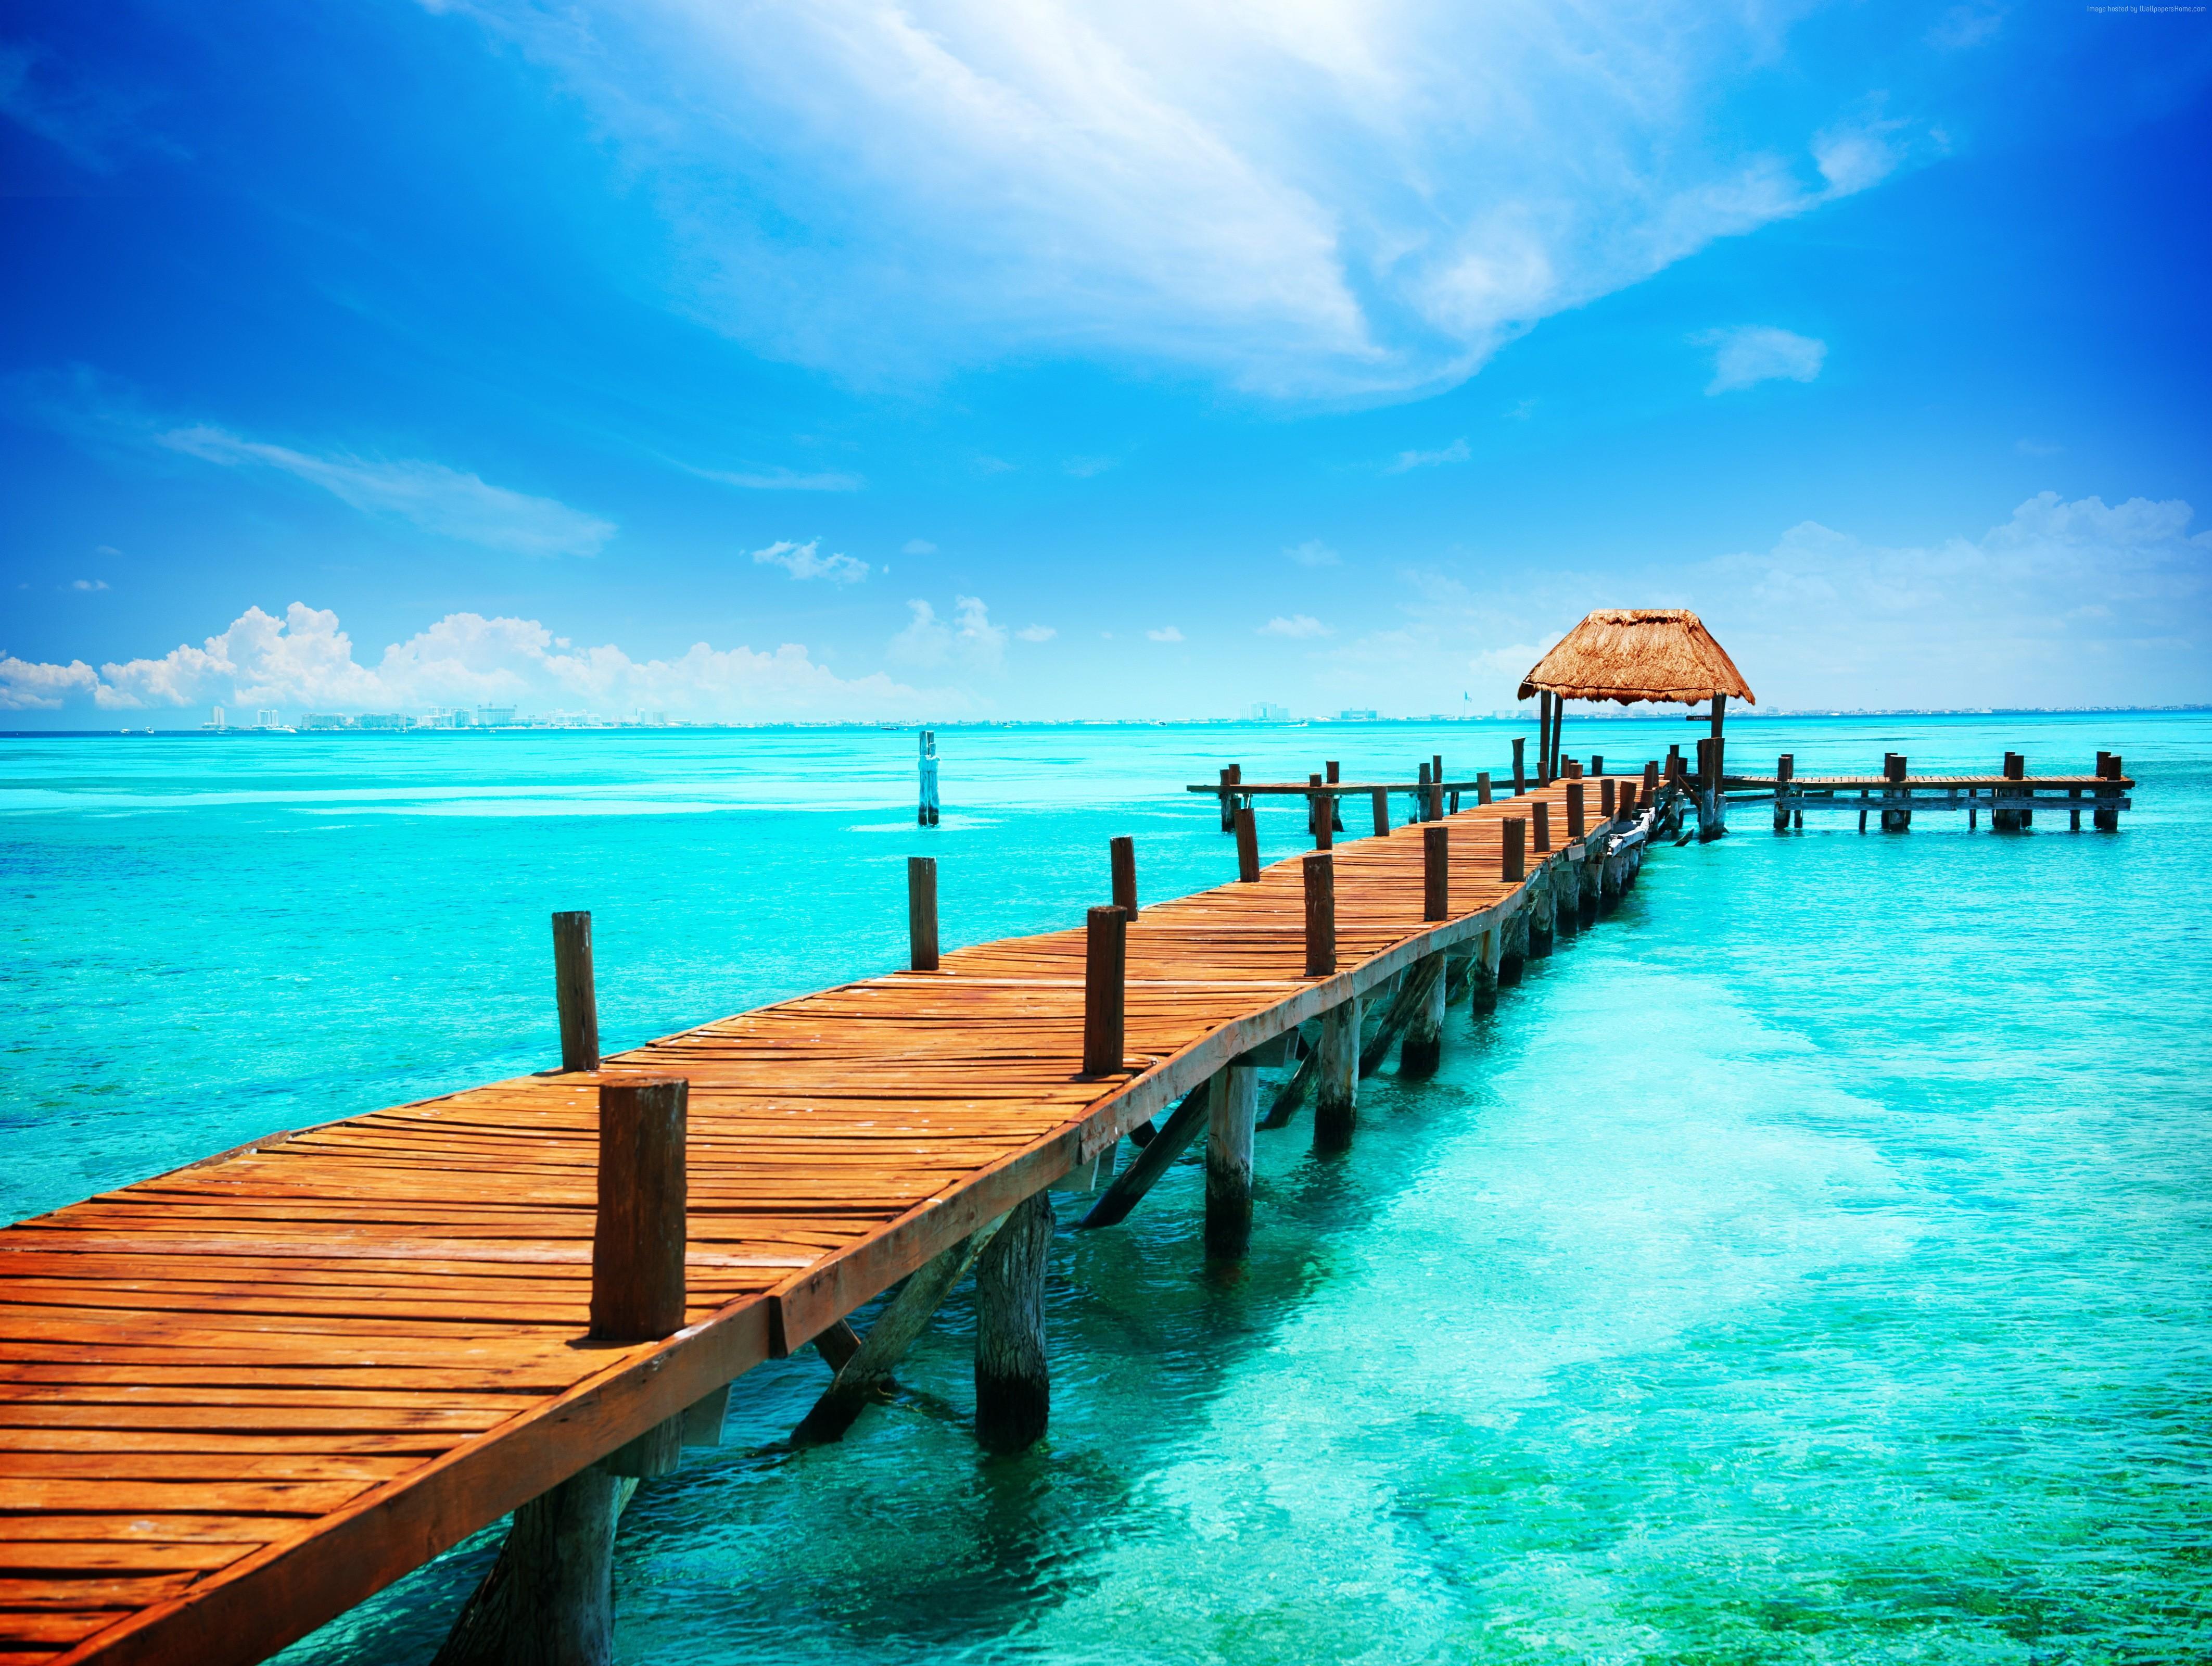 Cancun Wallpapers HD 4250x3200